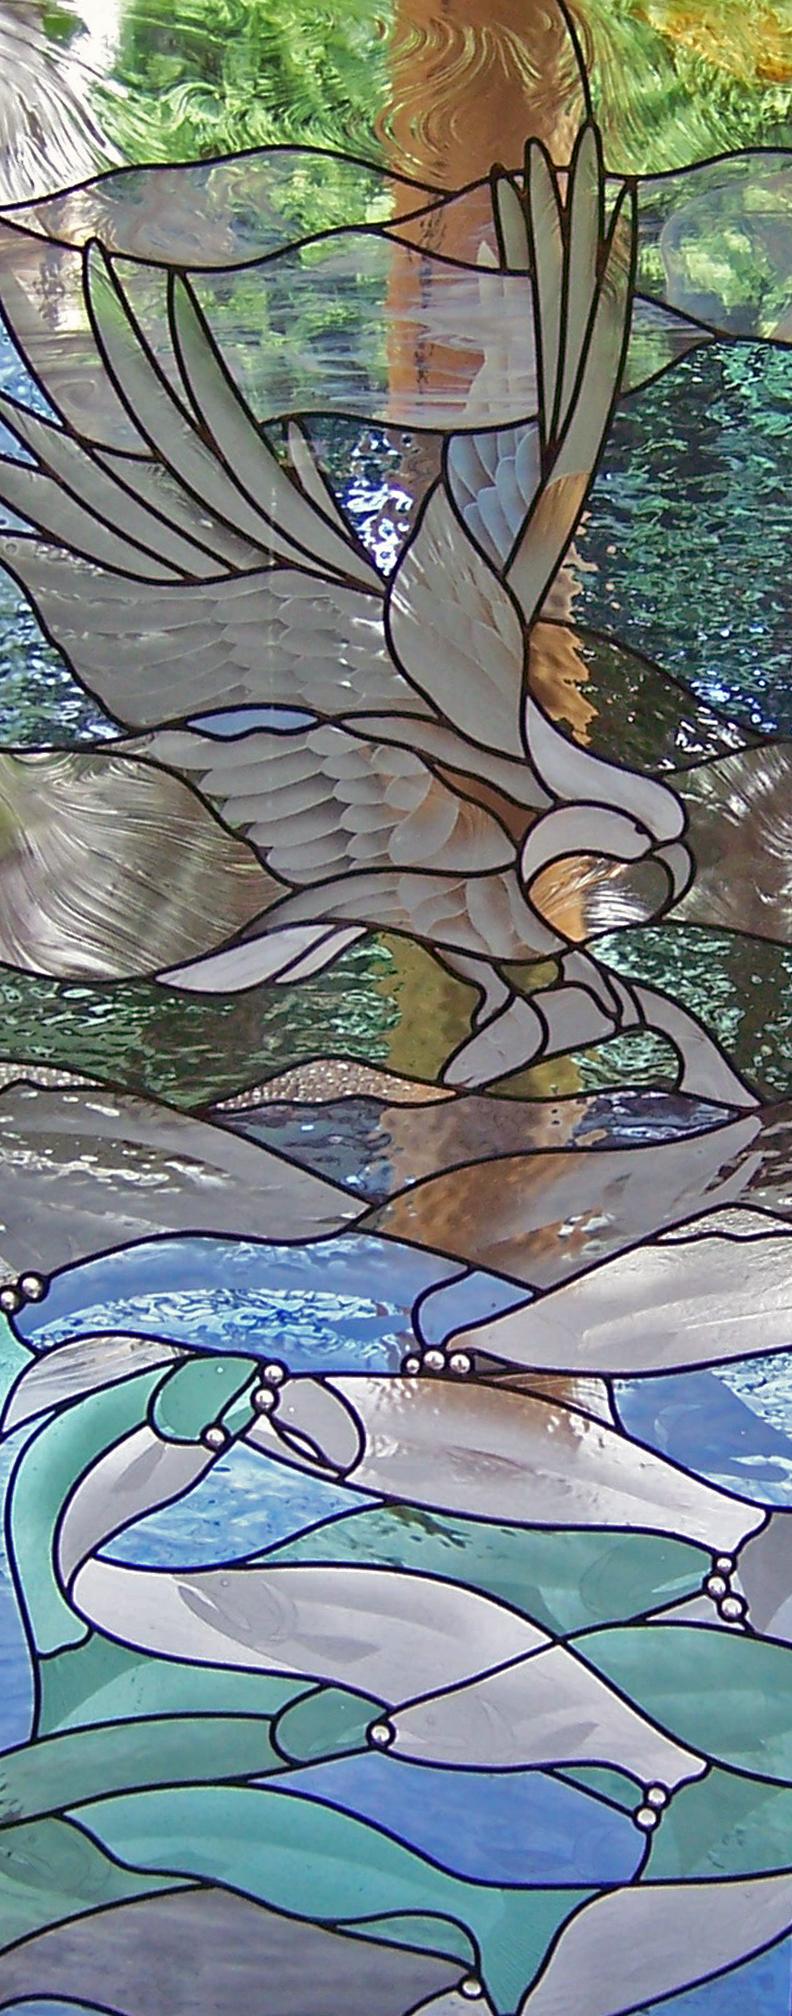 Copy of Birds & fish.jpg